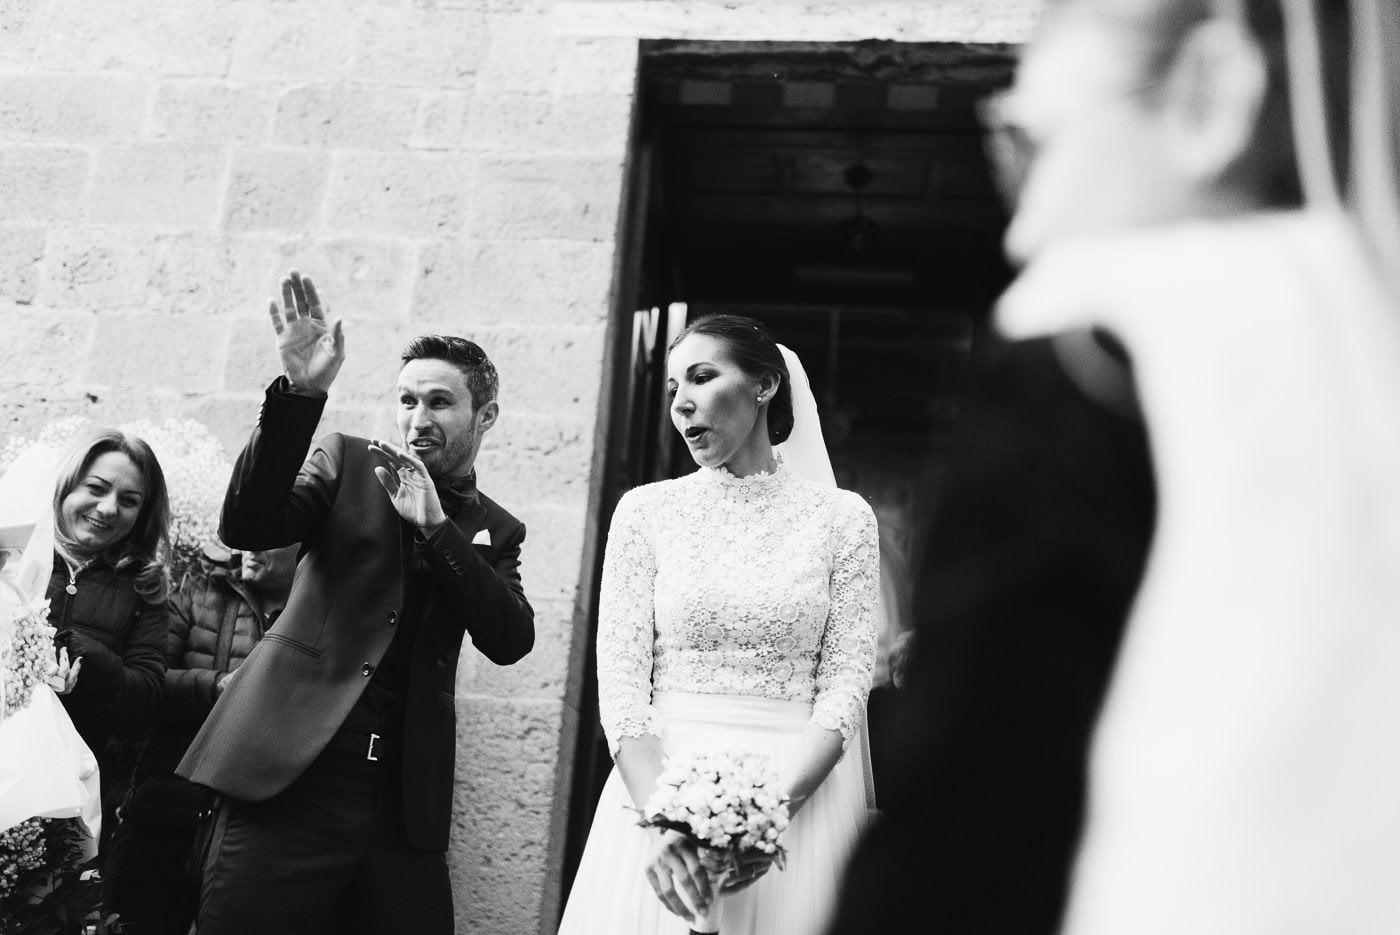 Matrimonio Giulia & Alessandro 28_12 – Alessio Nobili Photographer-34